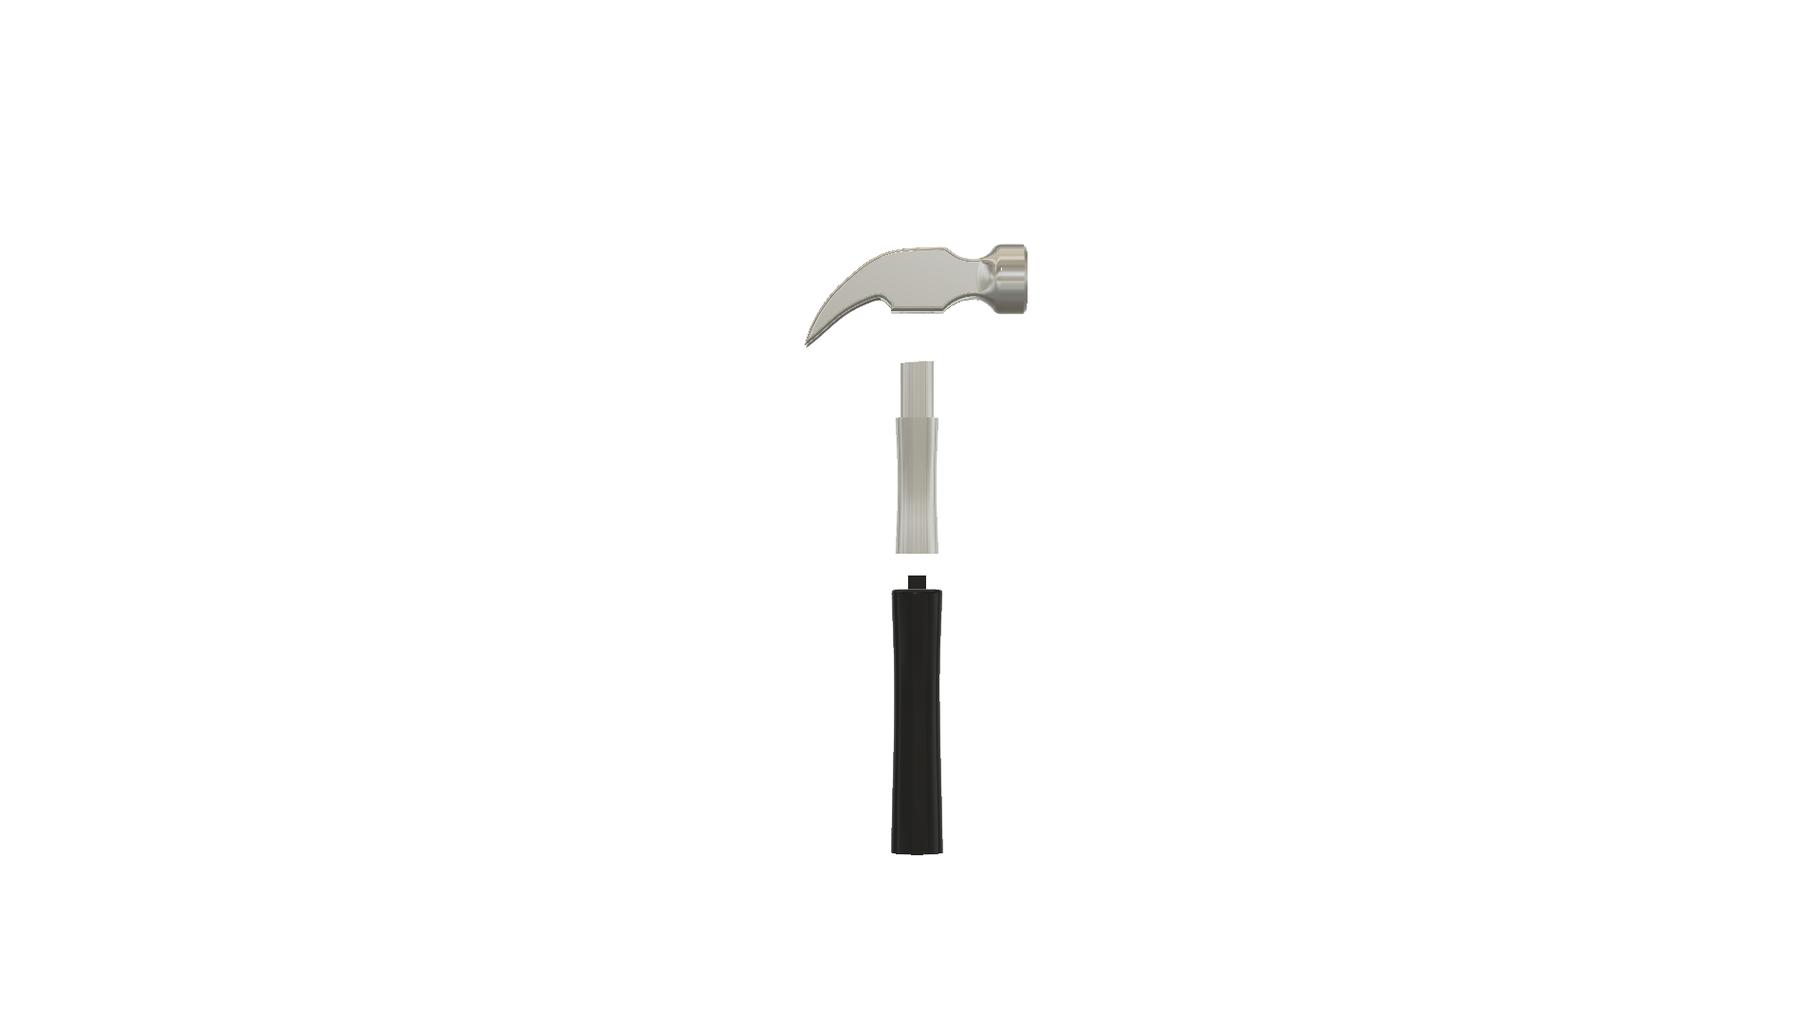 Assemble the Hammer.